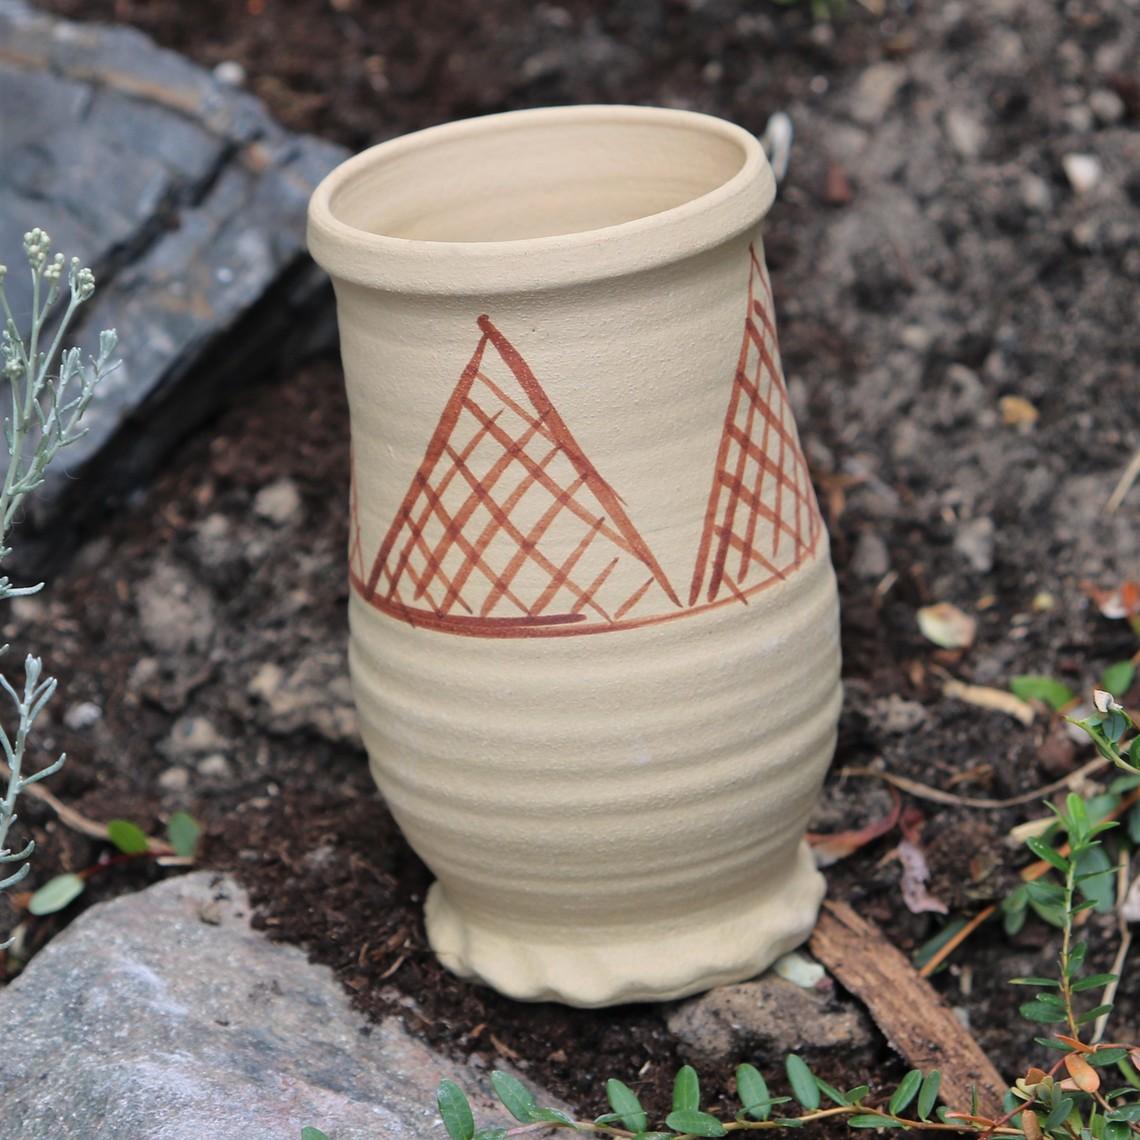 Pingsdorf Tasse 10-12th Jahrhundert